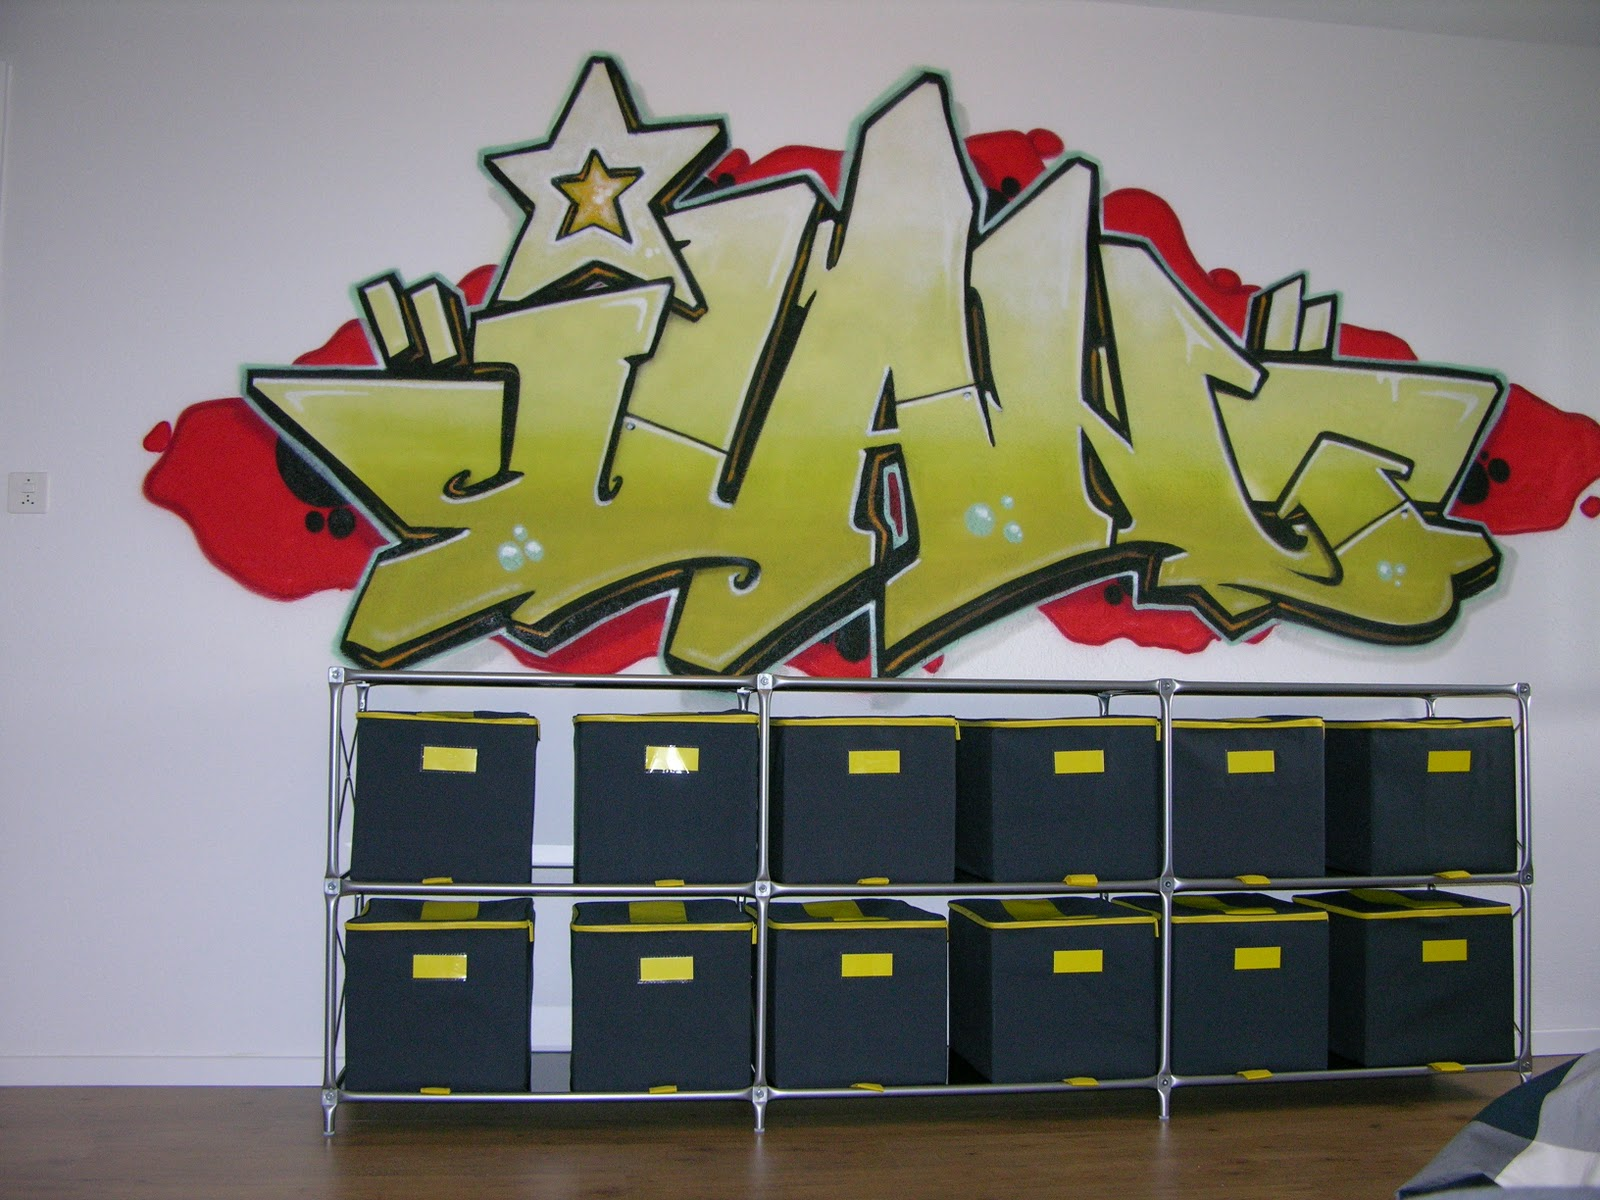 graffiti chambre d 39 enfant en suisse et france. Black Bedroom Furniture Sets. Home Design Ideas